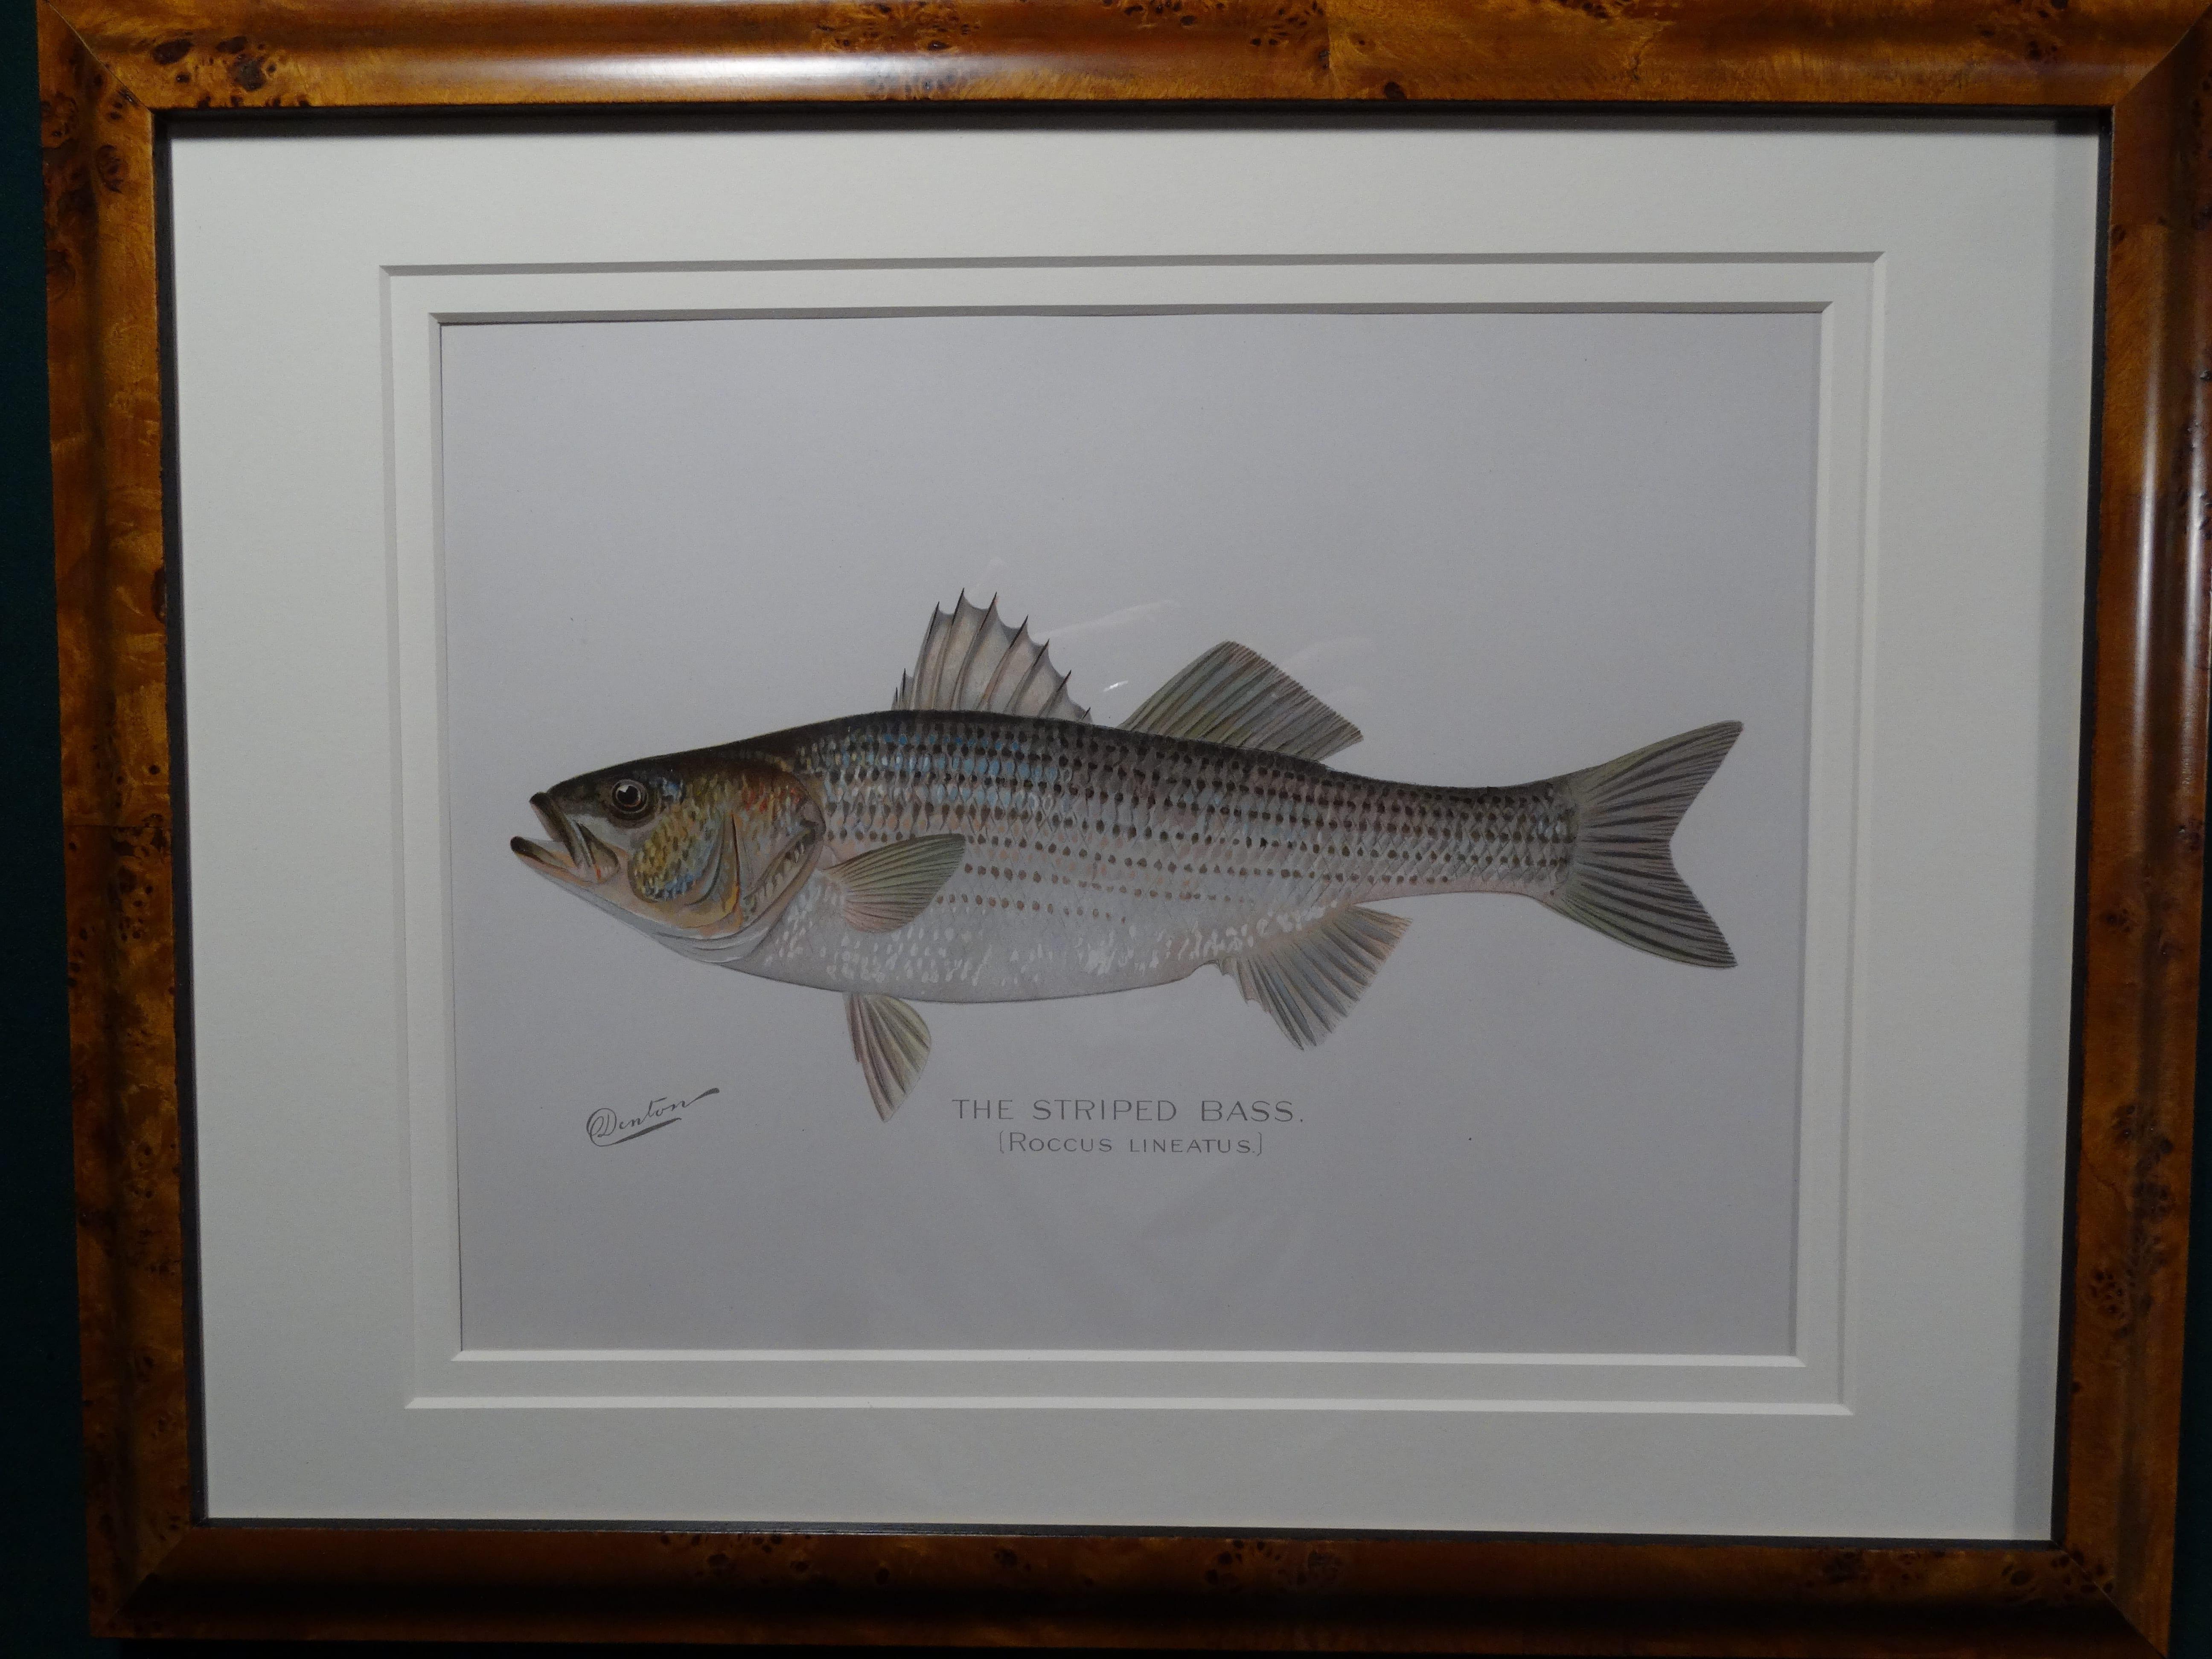 Framed Denton Striped Bass